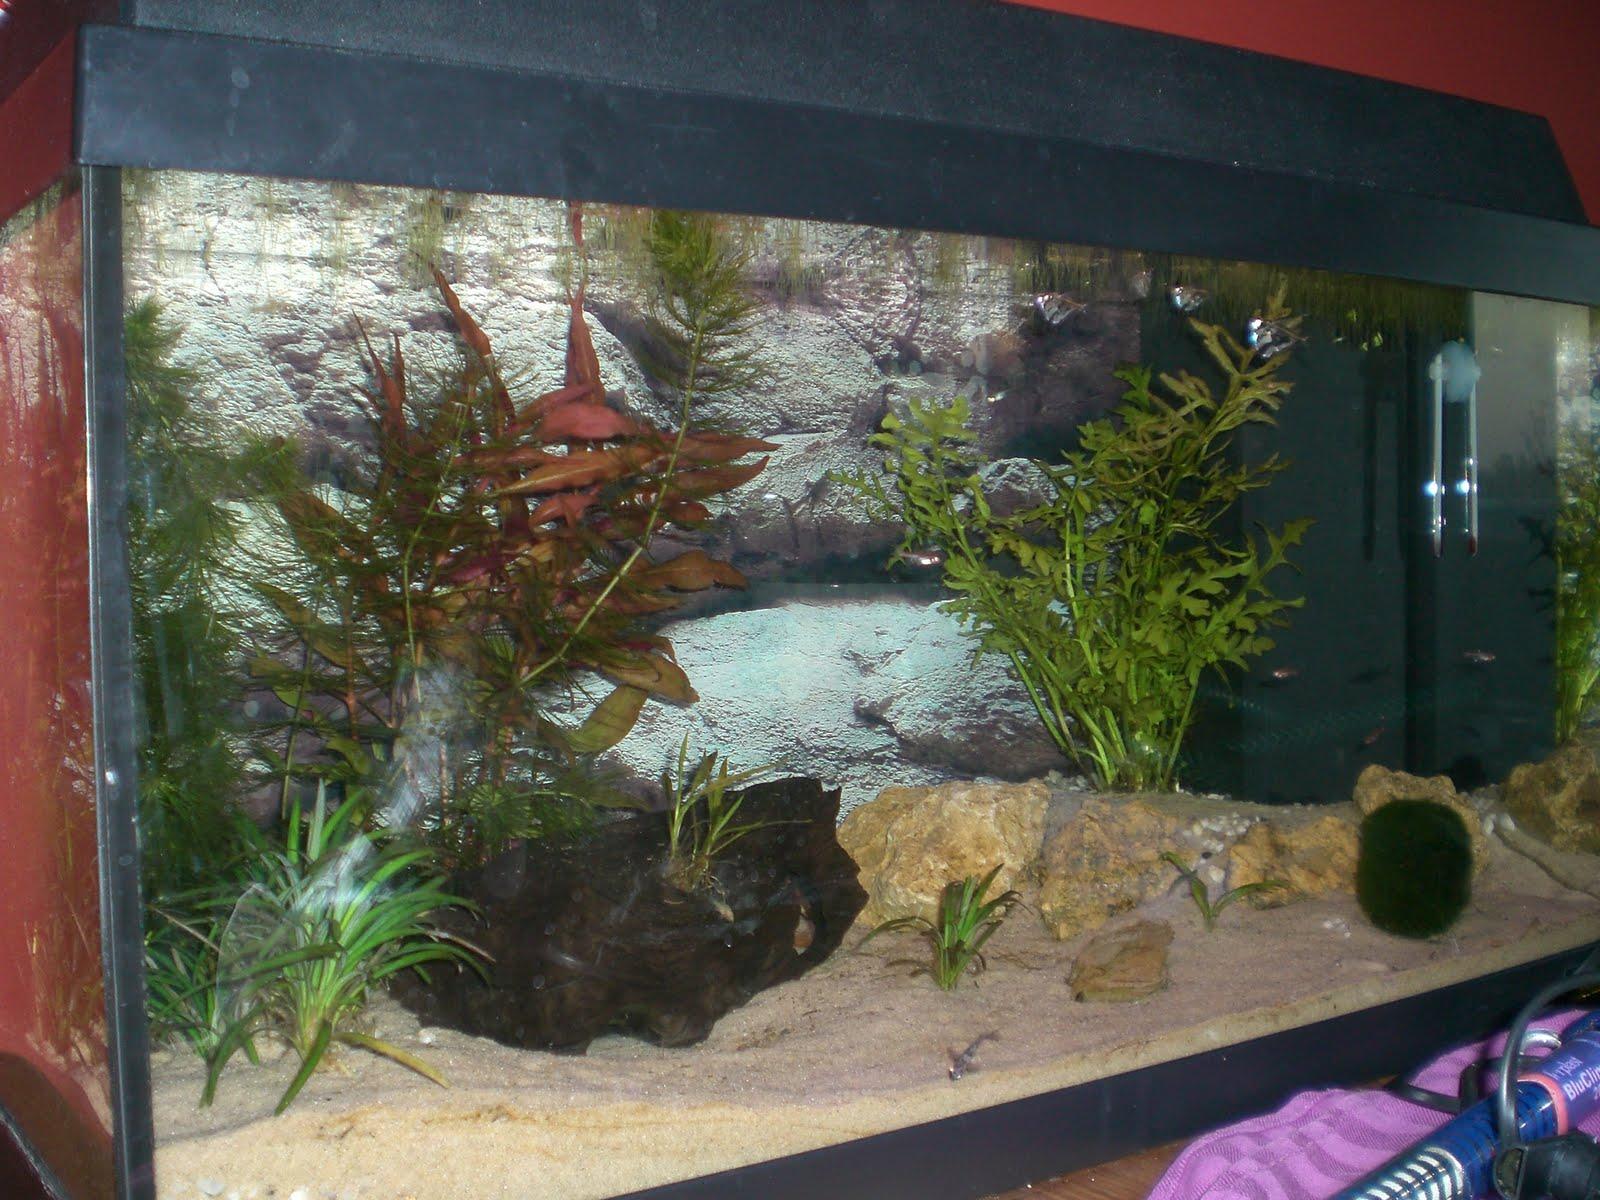 Bouw aquarium achterwand  Aquarium gekocht en zelf achterwand maken